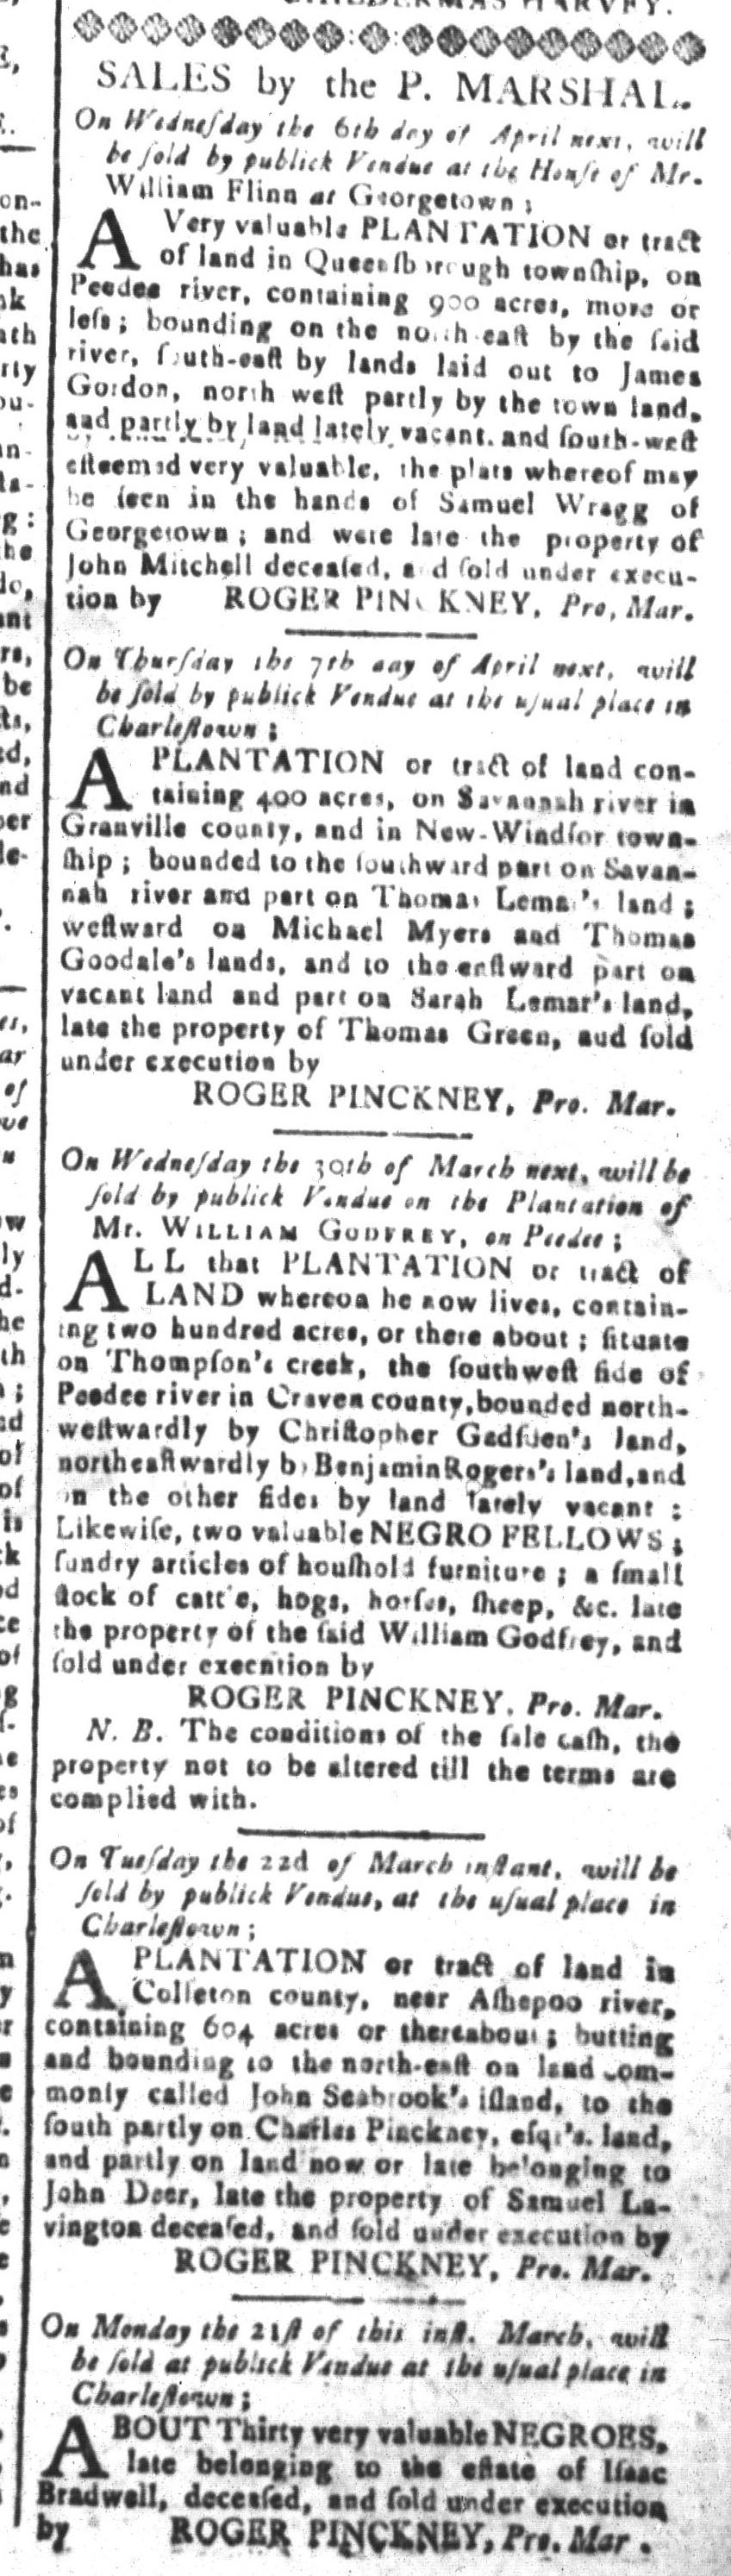 Mar 11 - South-Carolina and American General Gazette Slavery 7